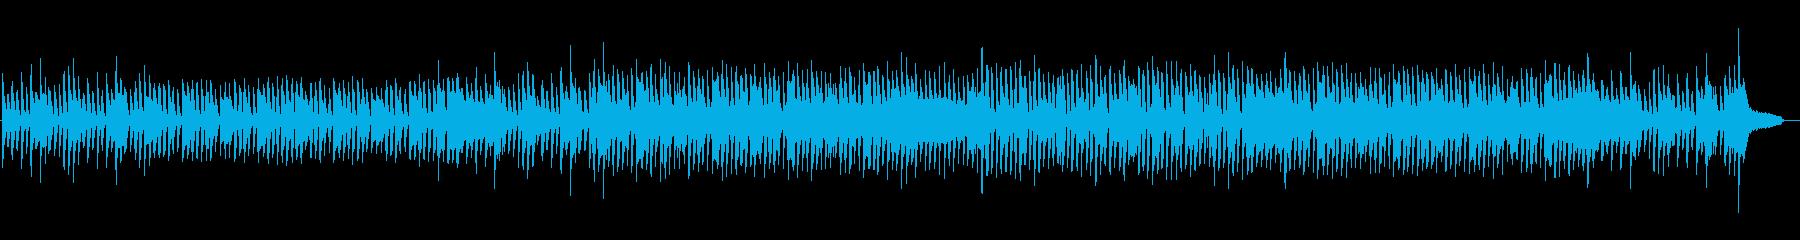 Positive Whistlingの再生済みの波形